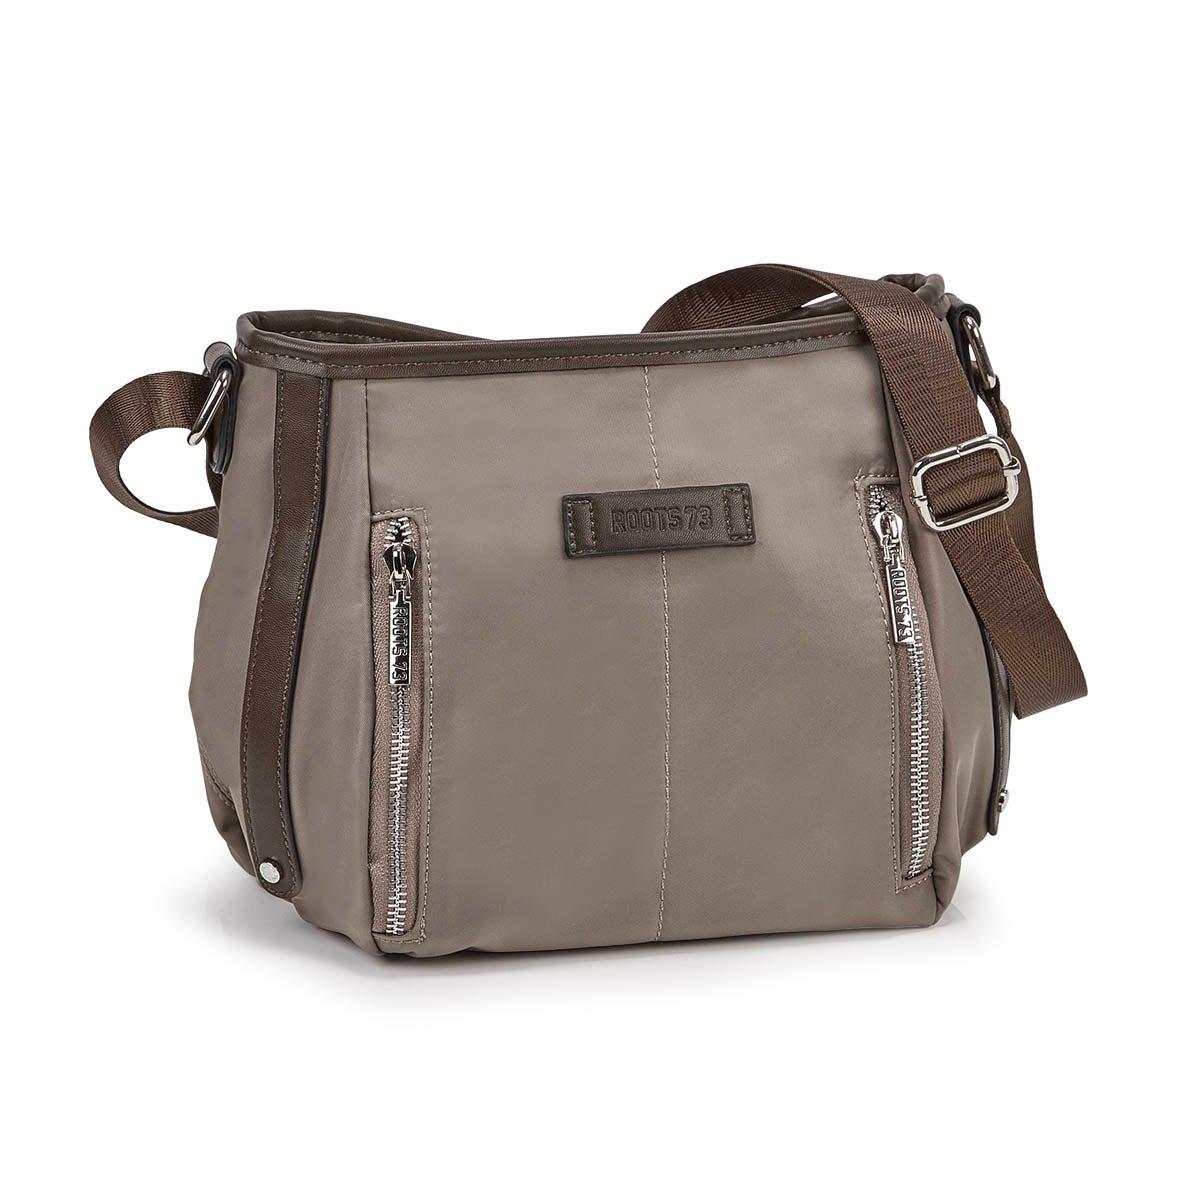 Women's R5299 EAST/WEST khaki hobo bag